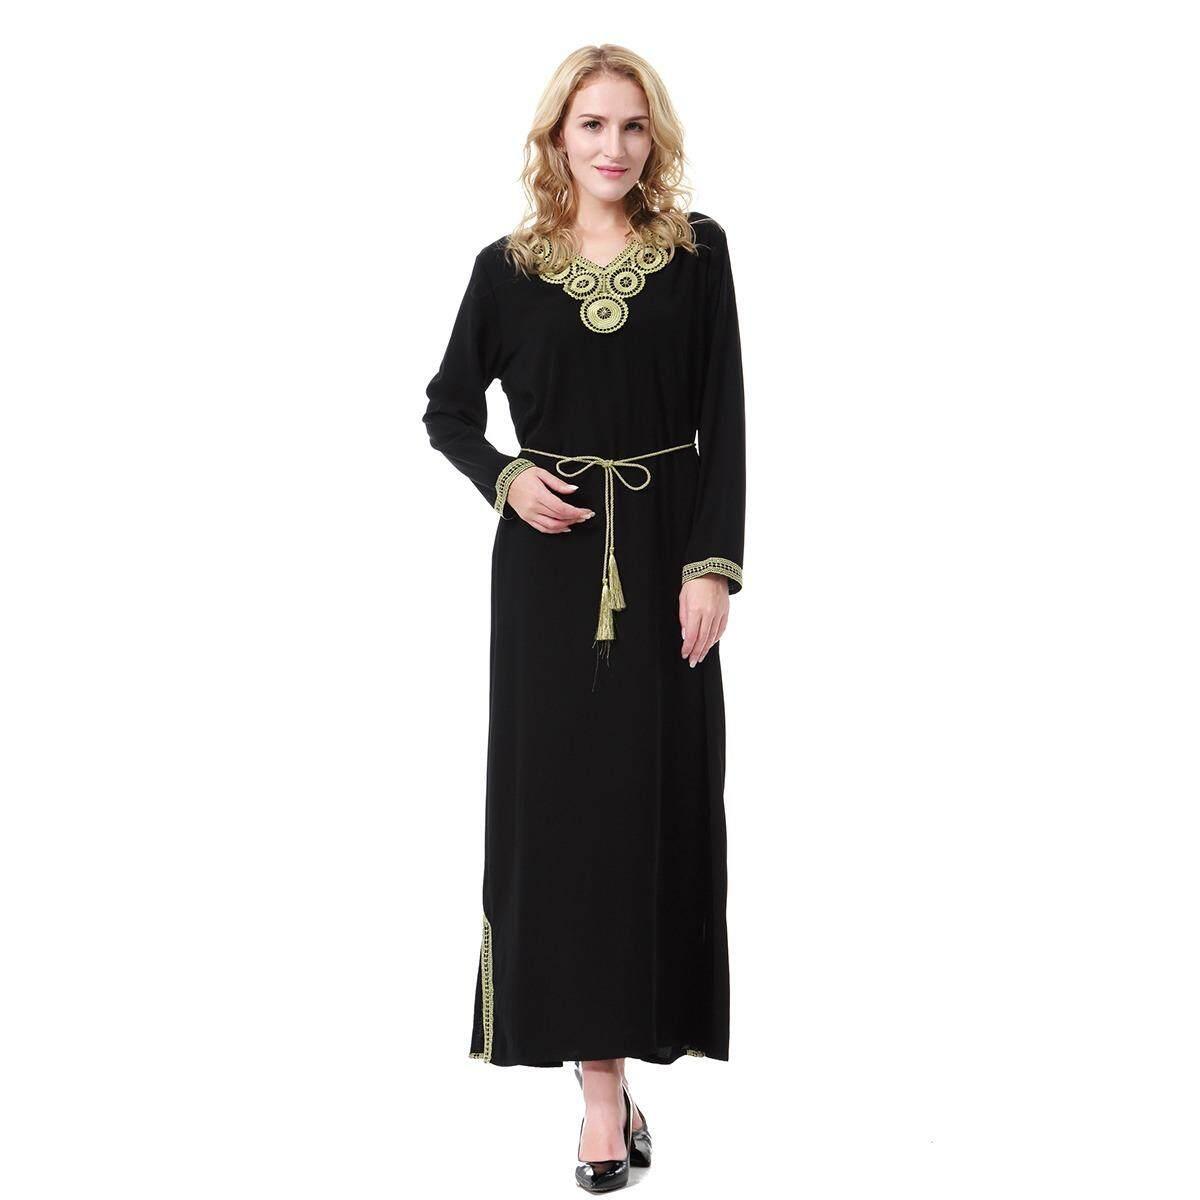 55f6a01eb1742e34ce0e44d0bcc18e6d Kumpulan List Harga Muslim Dress From Indonesia Paling Baru bulan ini